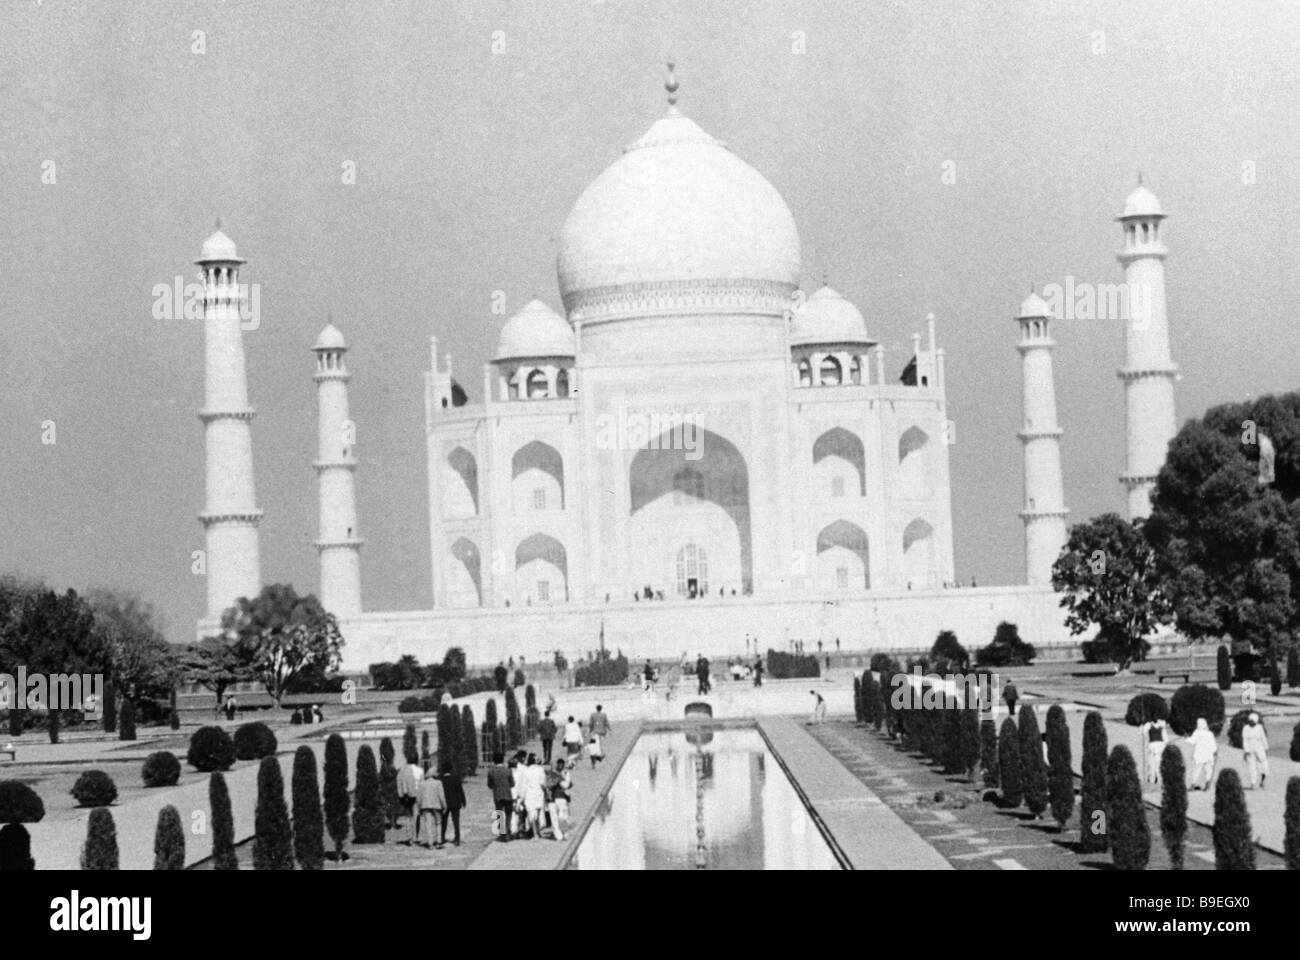 The Taj Mahal mausoleum of Sultan Shah Jahan and his wife Mumtaz Mahal at Agra Stock Photo